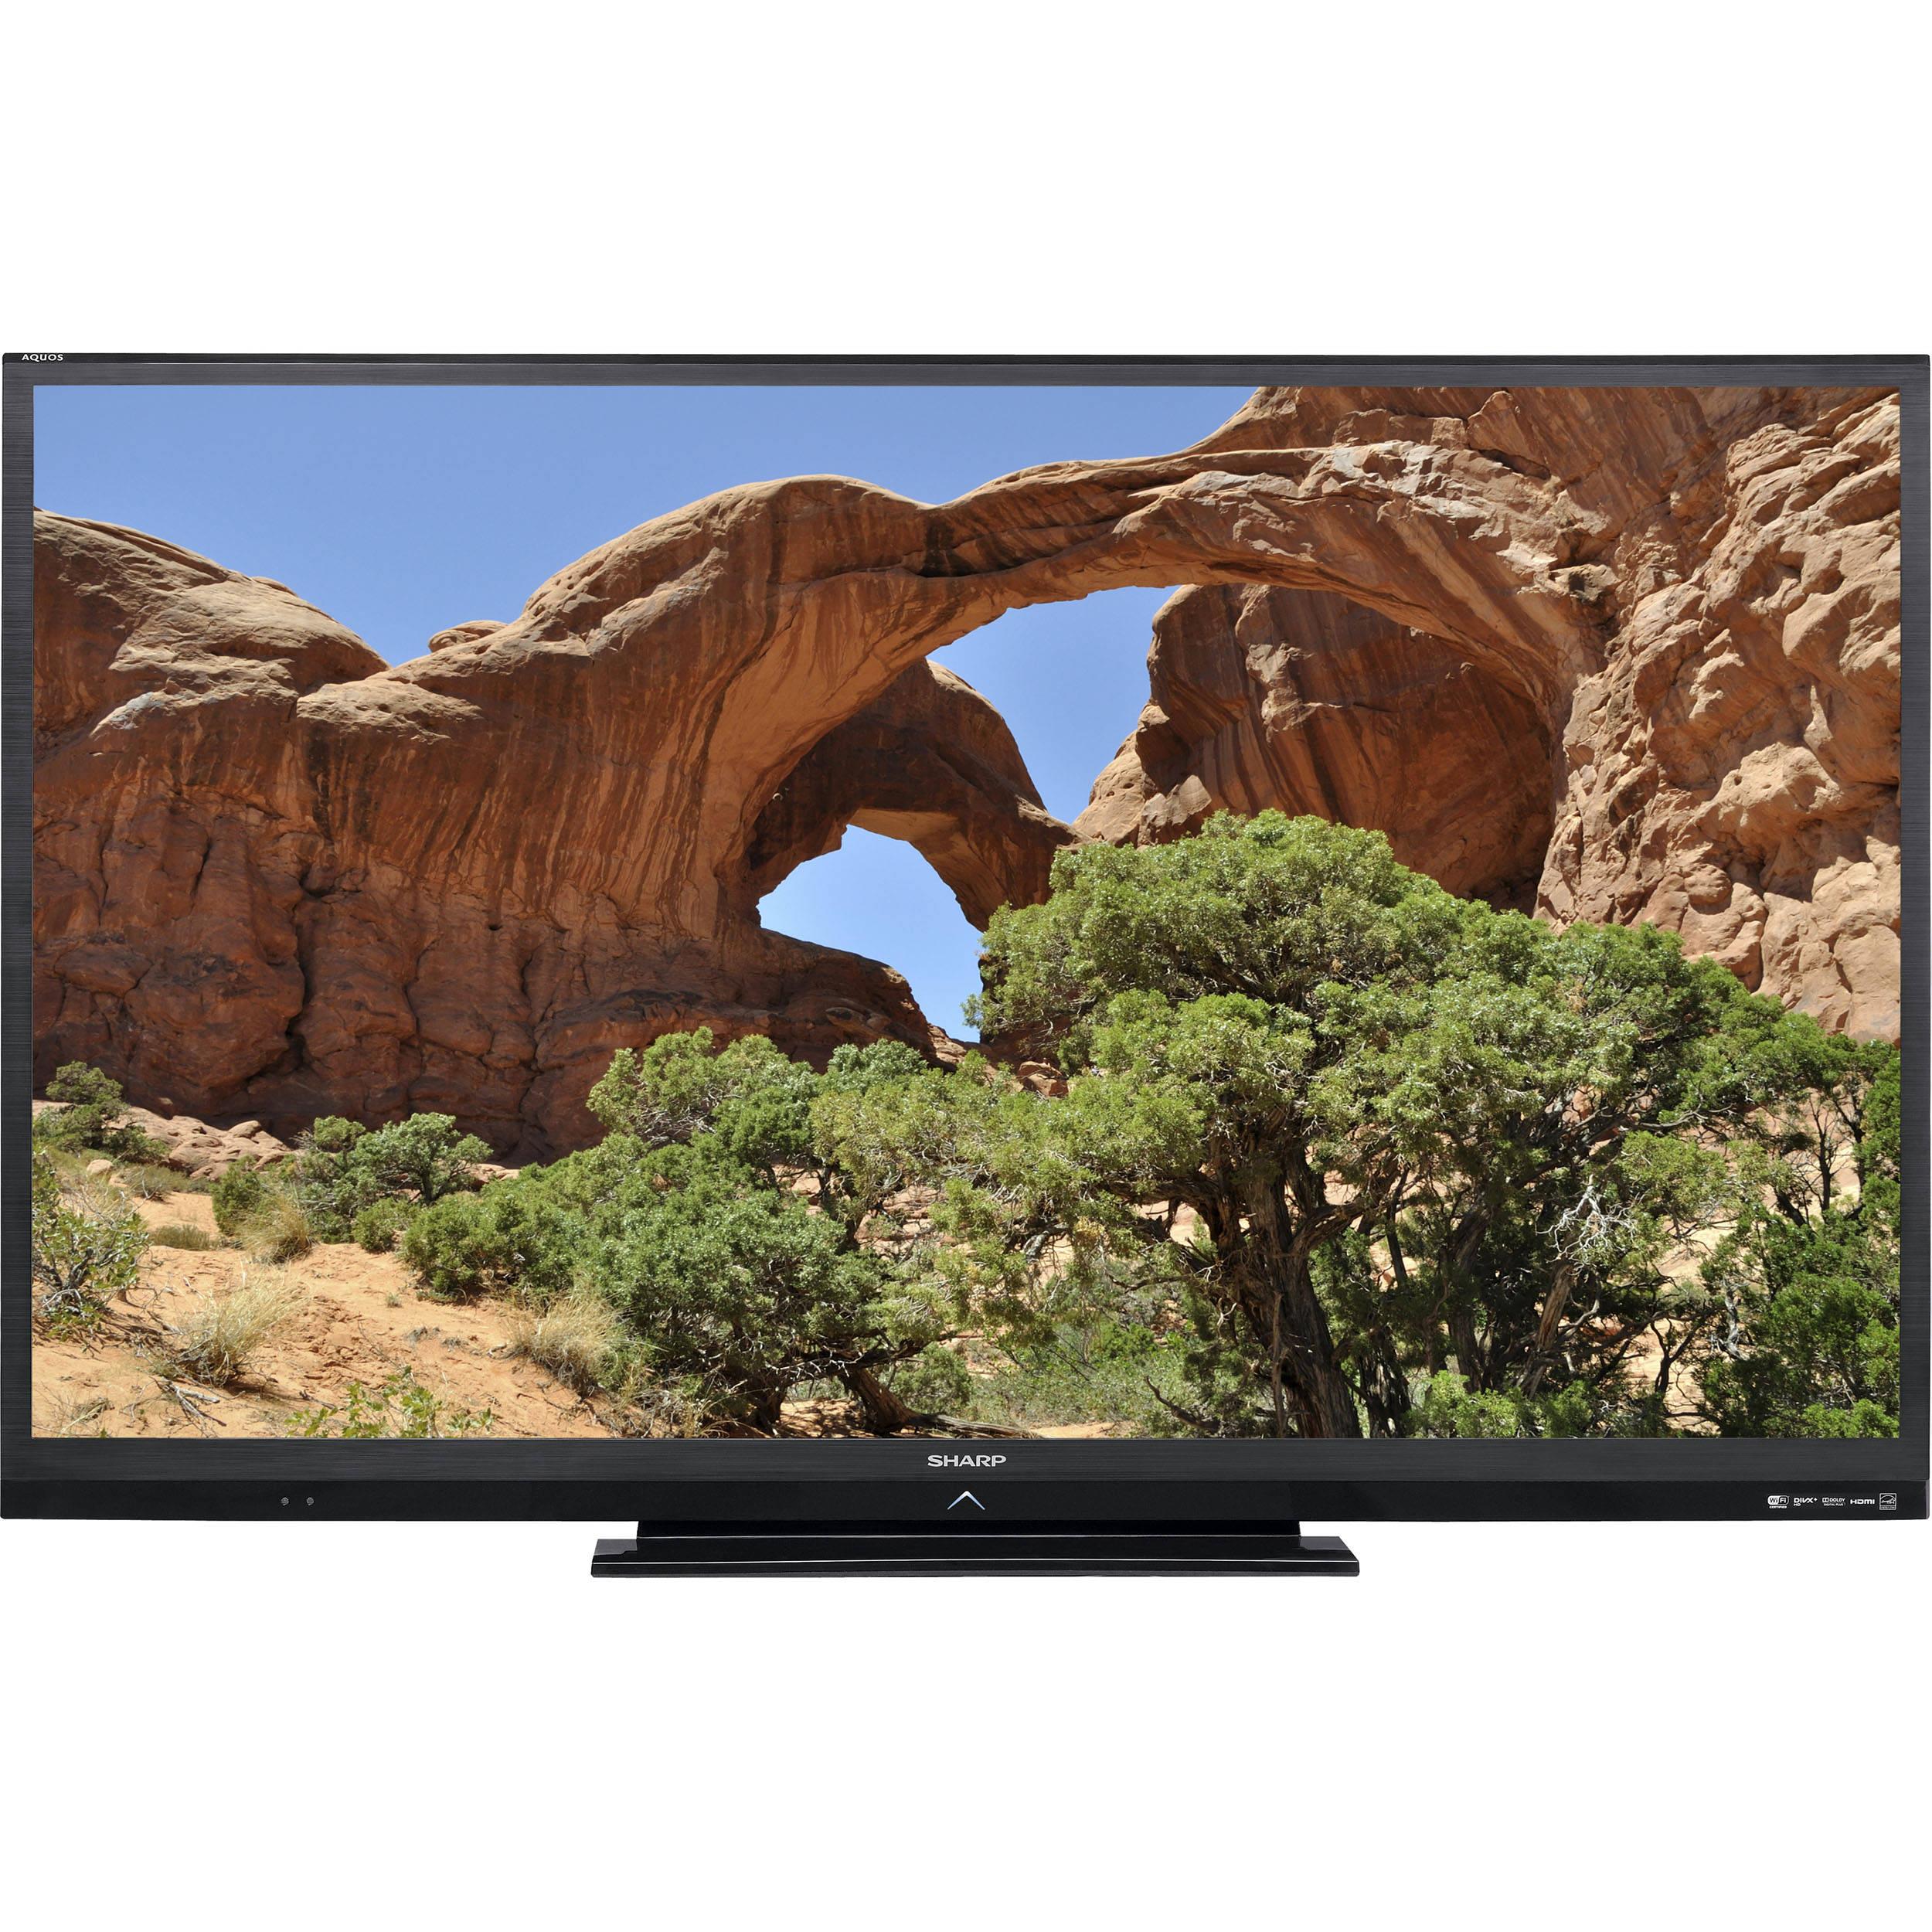 sharp lc 70le640u aquos 70 1080p led lcd tv lc70le640u b h rh bhphotovideo com sharp aquos quattron 70 inch manual Sharp AQUOS 60 Inch TV